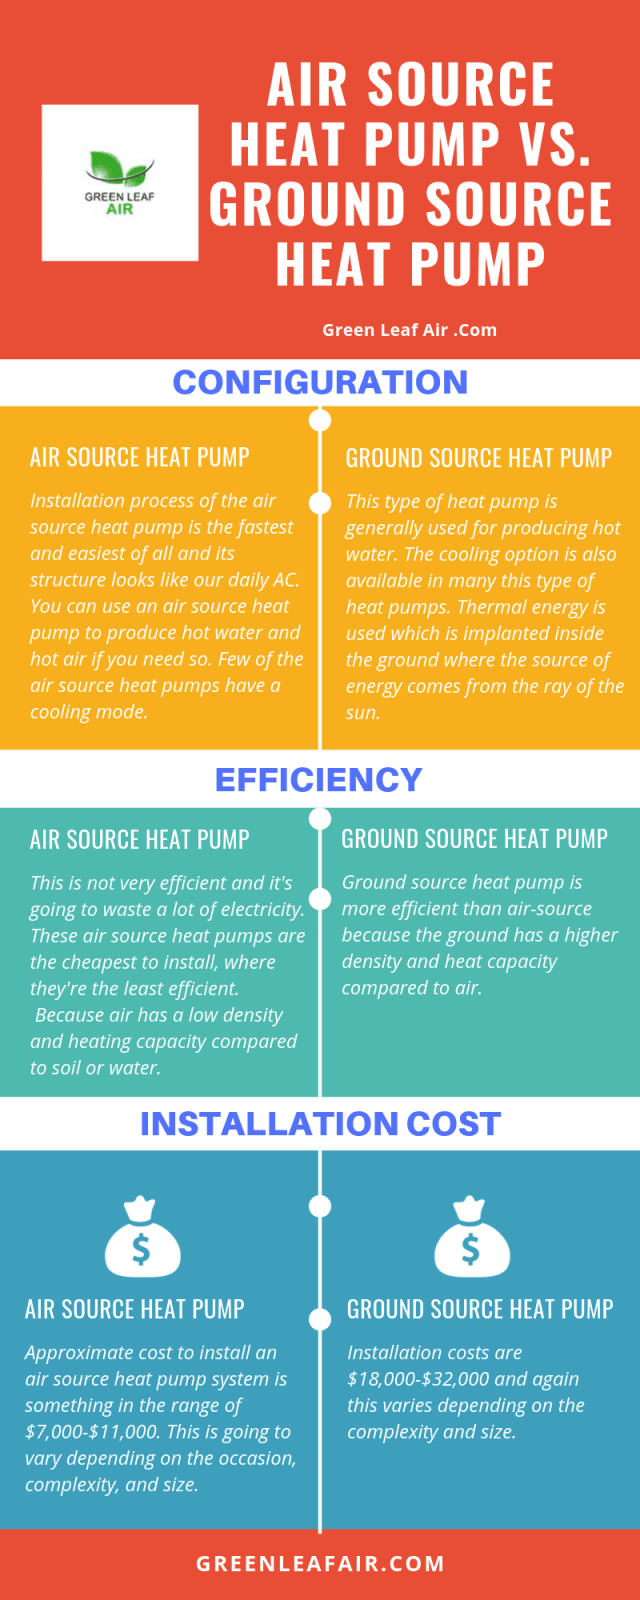 Air Source Heat Pump vs. Ground Source Heat Pump [Infographic]